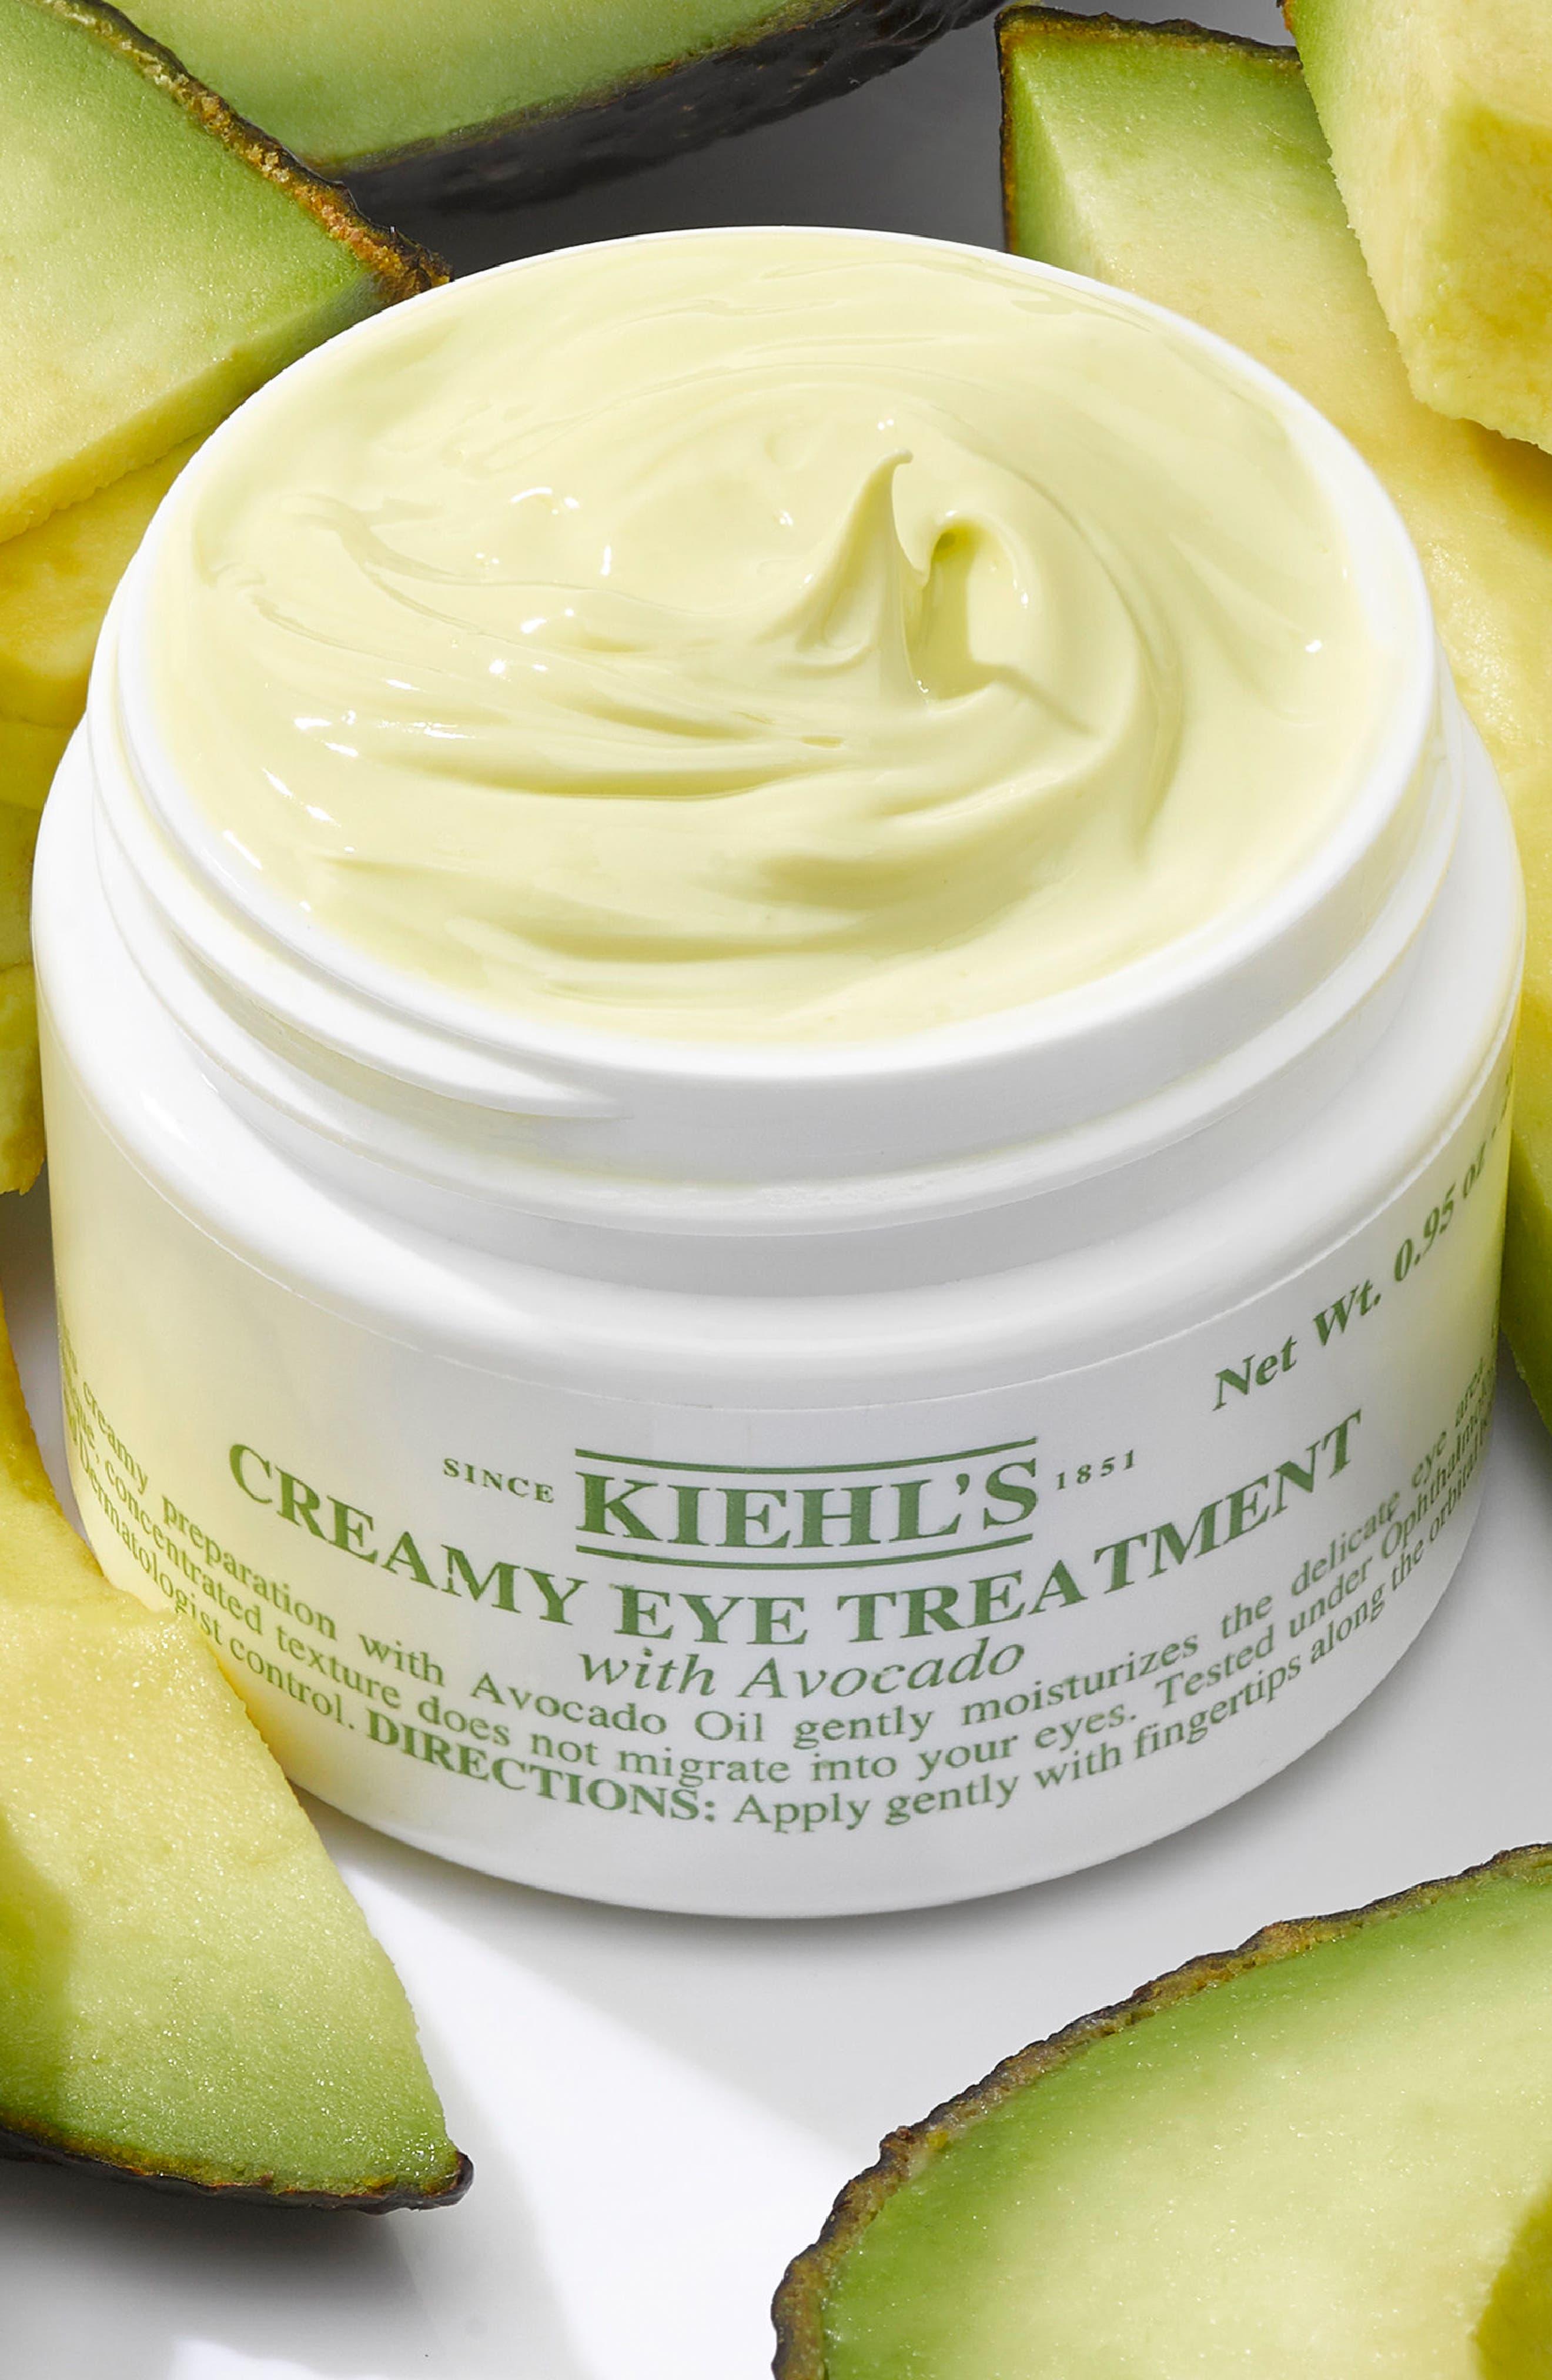 Creamy Eye Treatment with Avocado,                             Alternate thumbnail 3, color,                             No Color